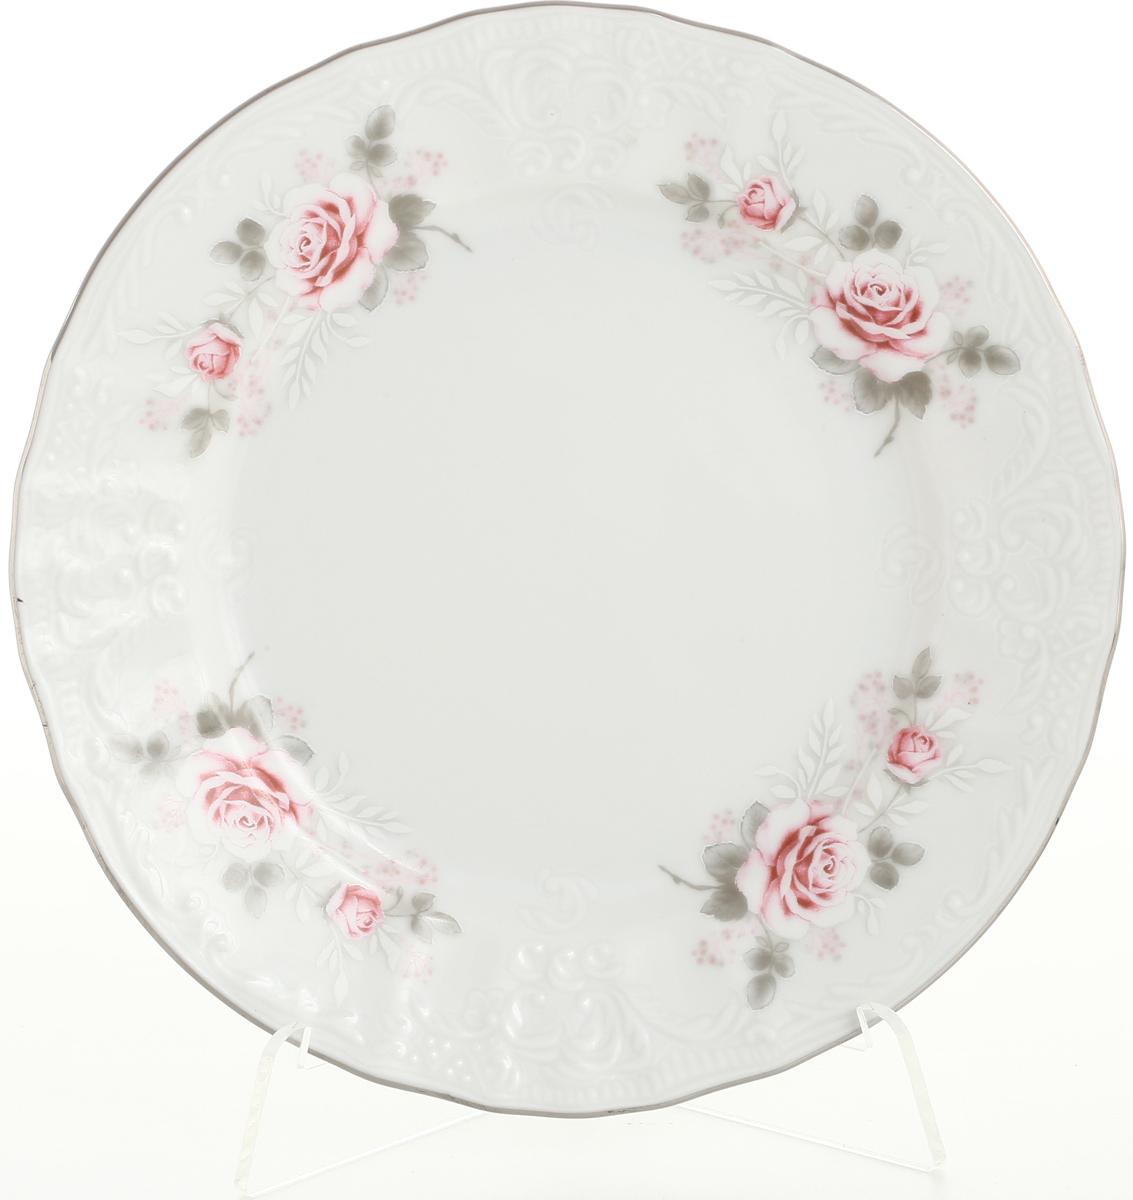 Набор тарелок Bernadotte Серая роза. Платина, диаметр 17 см, 6 шт набор глубоких тарелок bernadotte серая роза золото диаметр 23 см 6 шт